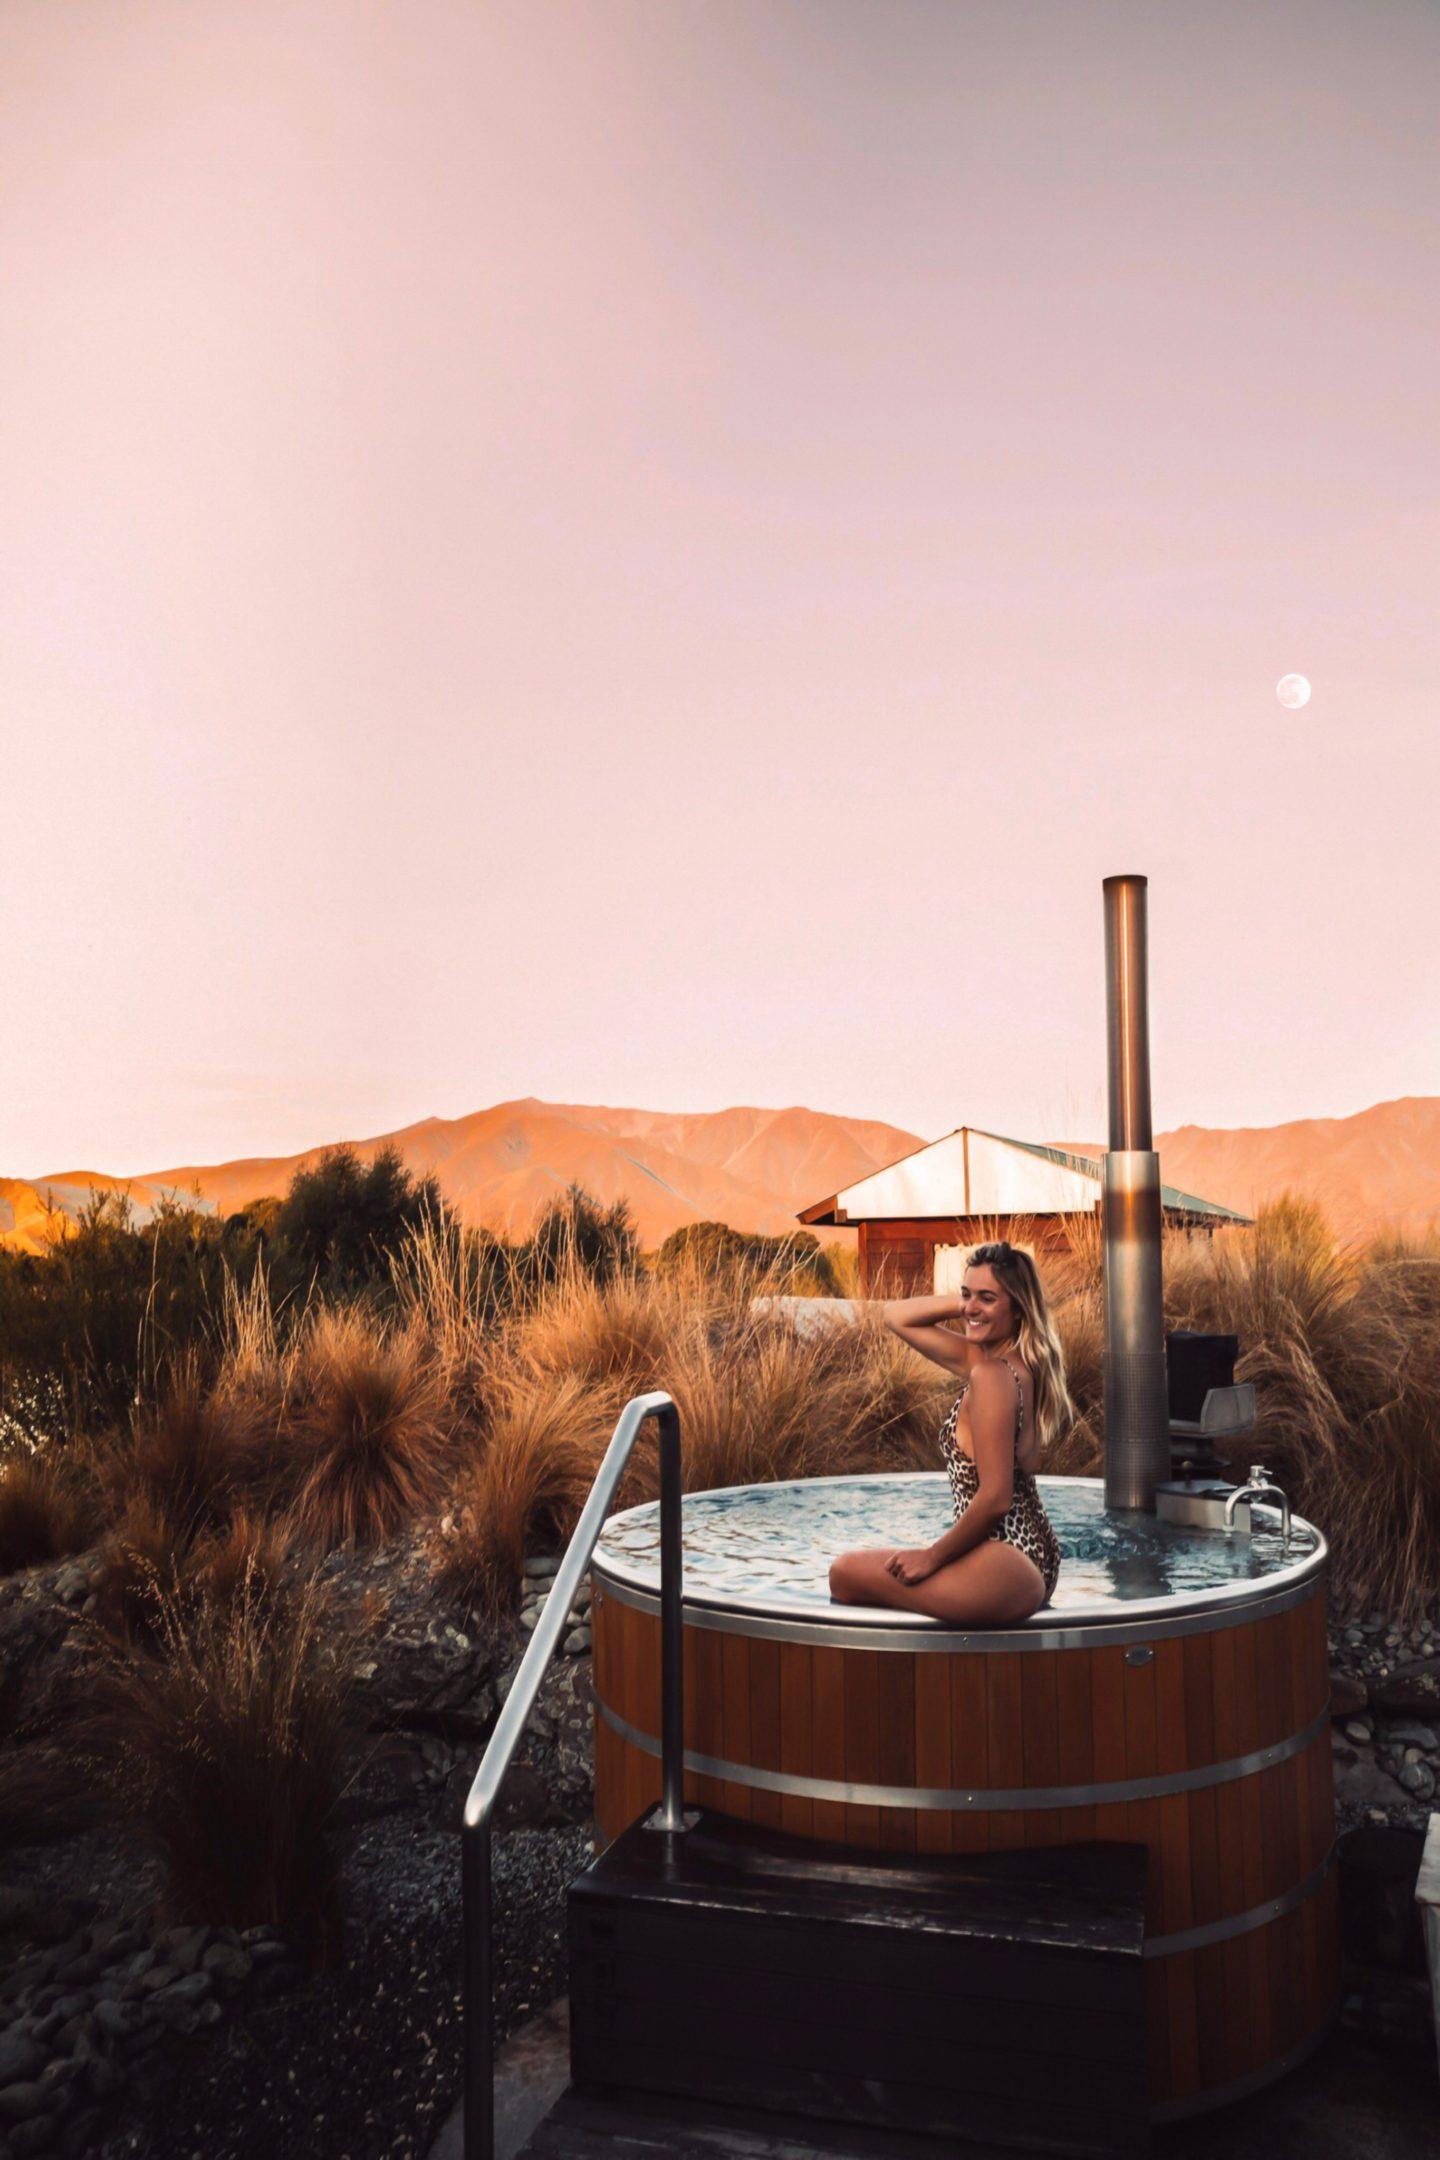 Omarama Hot Tub - Blondie Baby blog voyages et mode